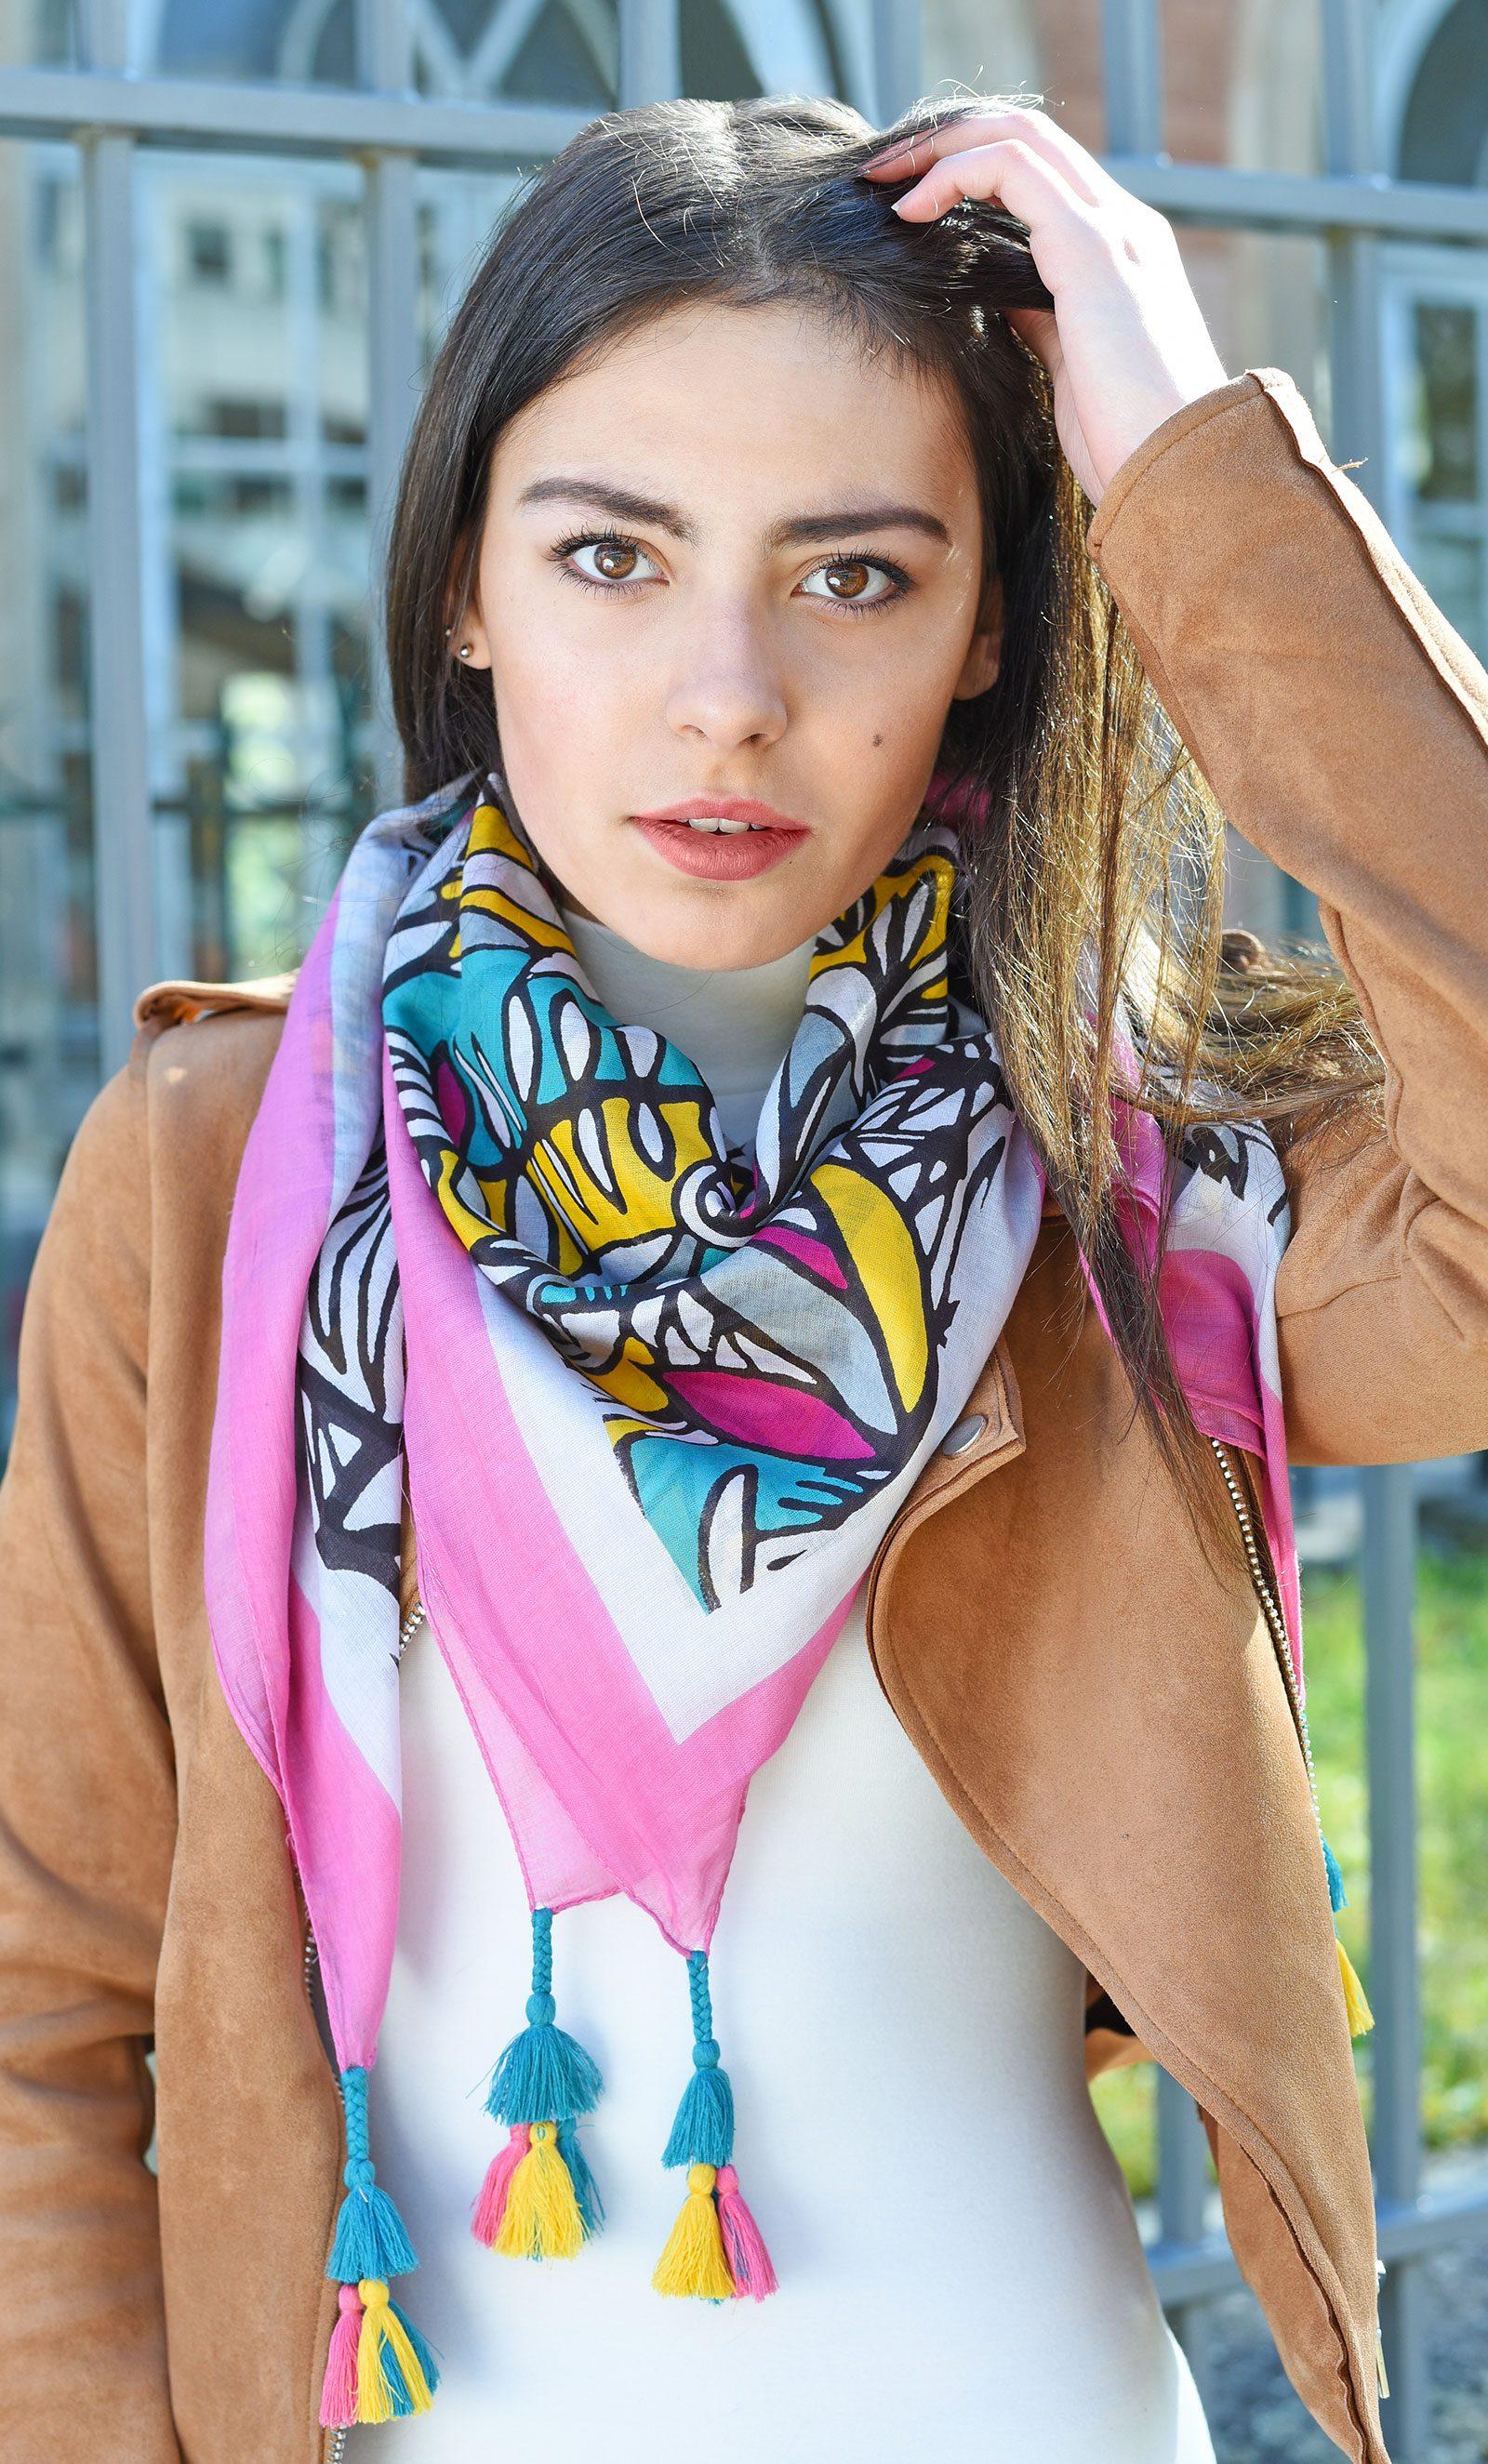 http://lookbook.allee-du-foulard.fr/wp-content/uploads/2018/05/0662-ADF-Accessoires-de-mode-LB-Coll-ethnique-valoa-rose-1-1-1600x2650.jpg